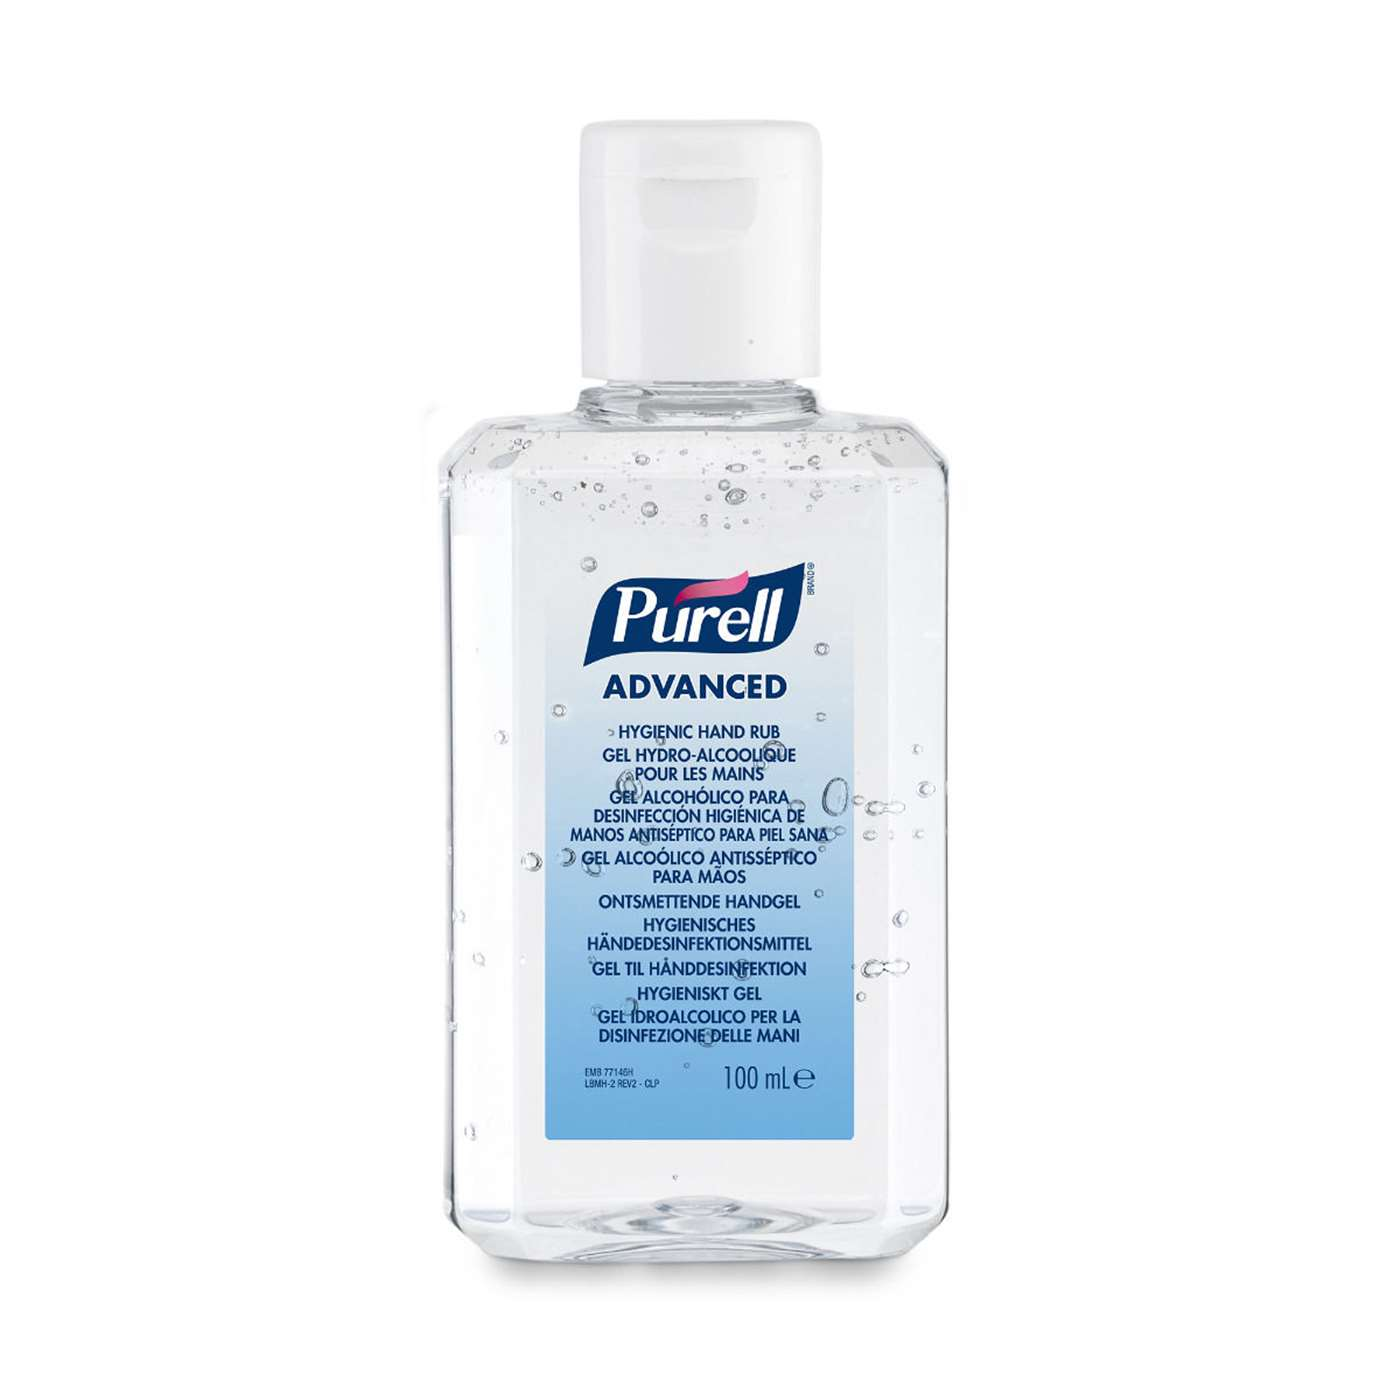 Purell Advanced Hand Sanitiser 100ml